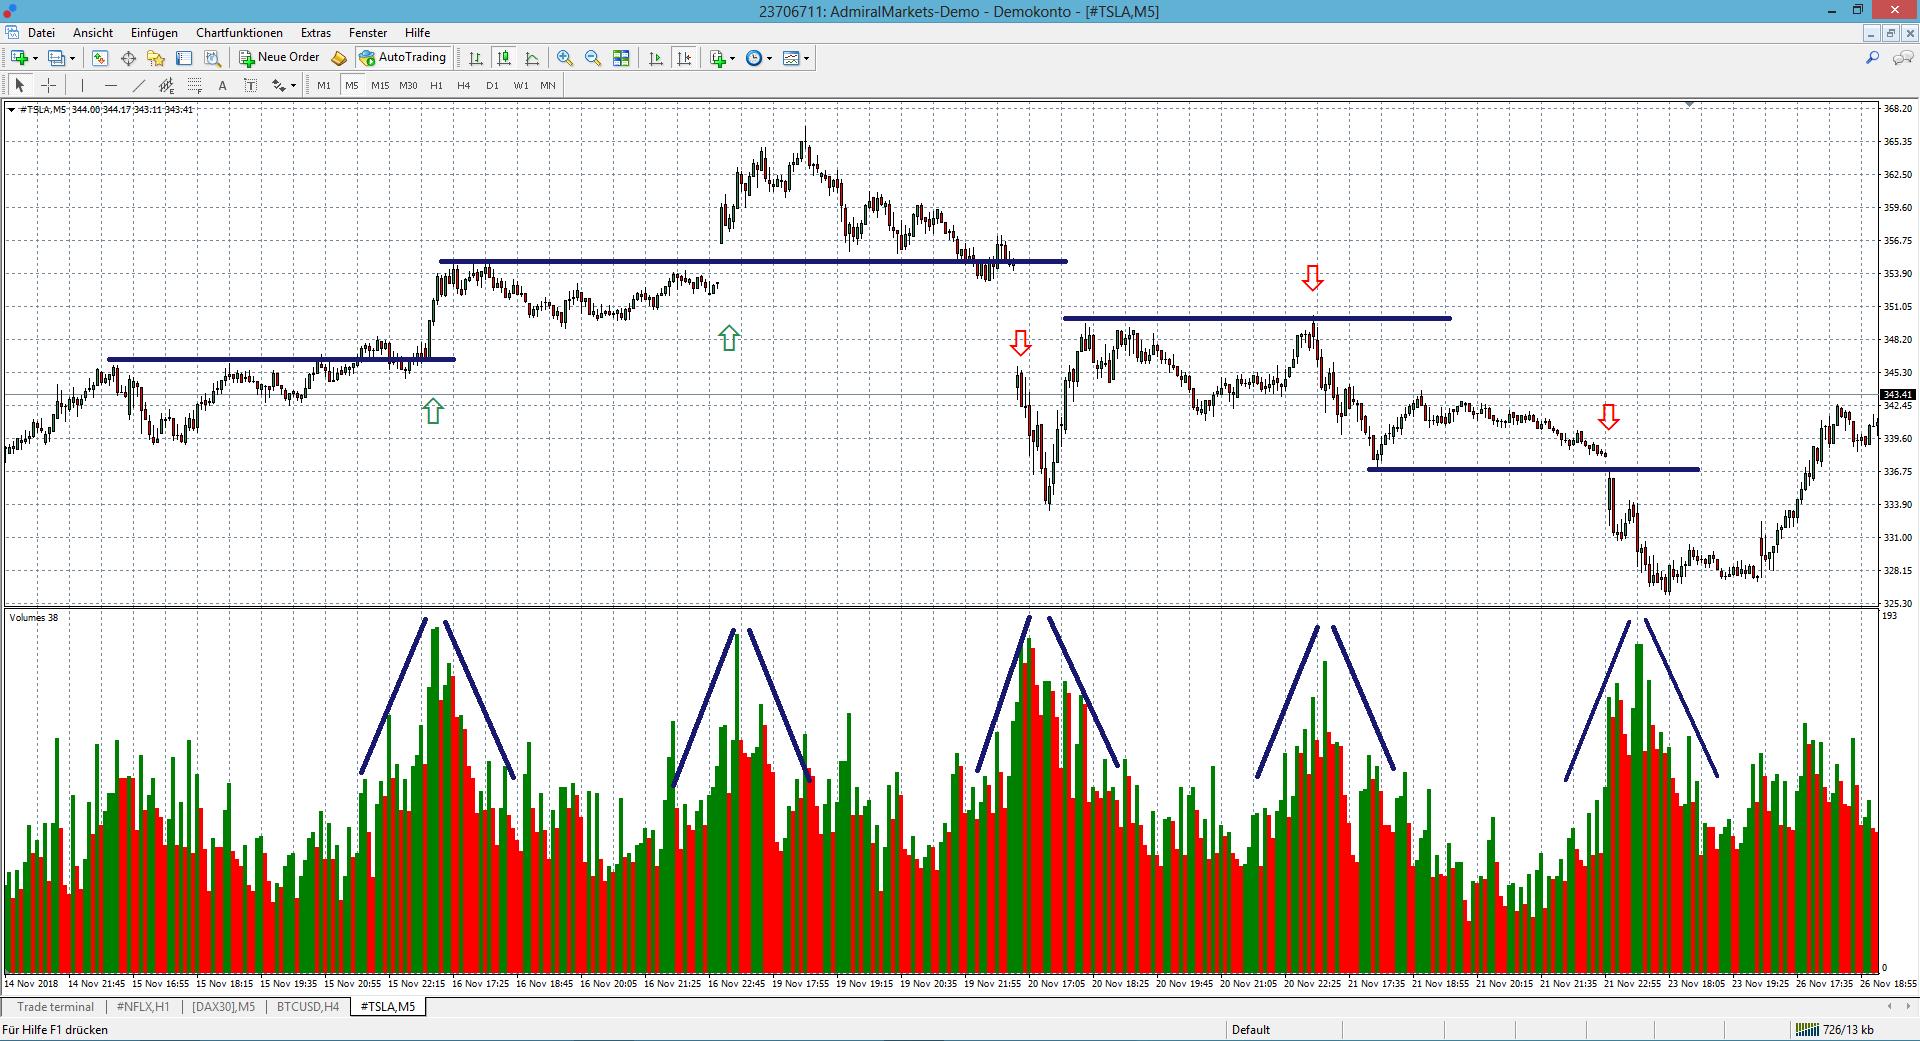 Volumen Trading Admiral Markets Chart 1